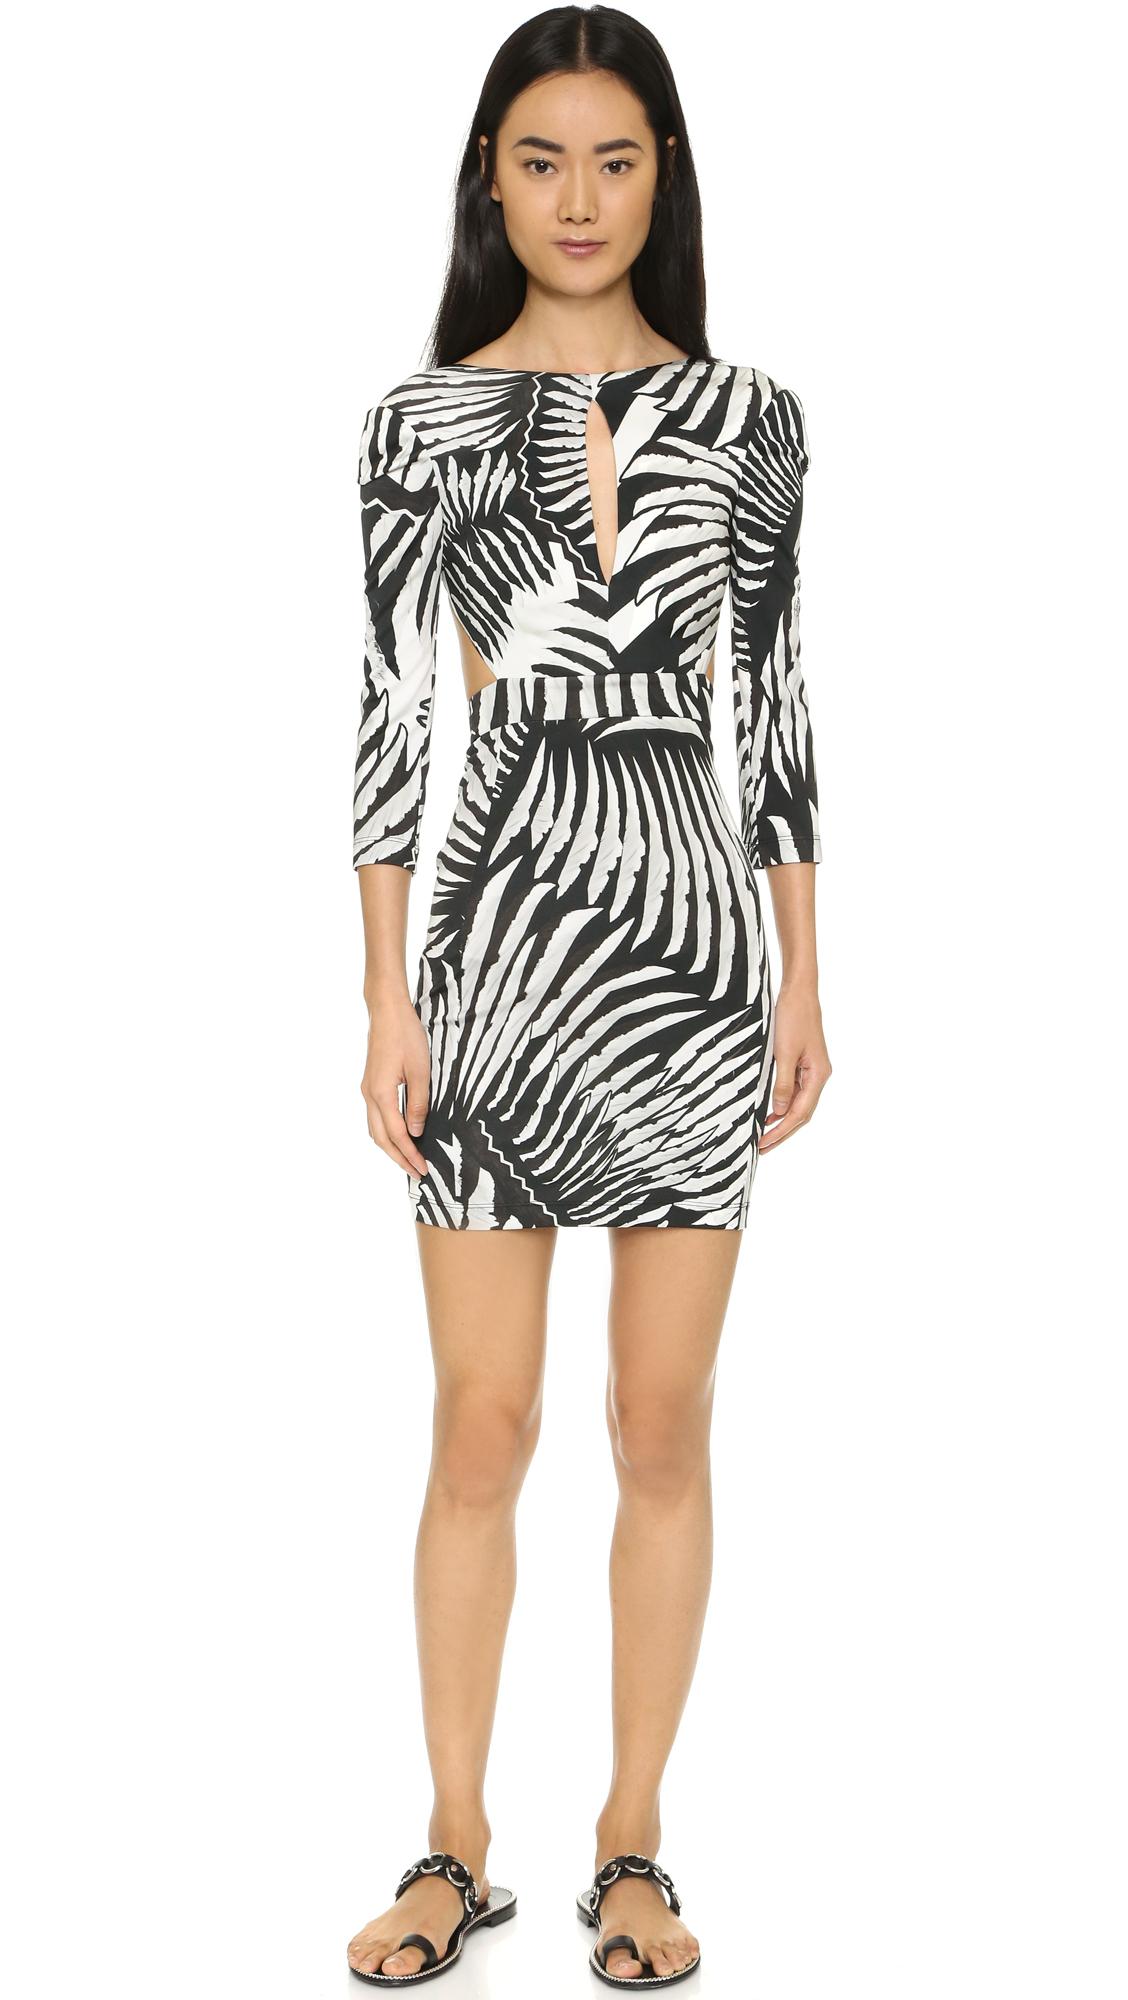 8111c50801c Lyst - Just Cavalli Kraken Print Dress in White